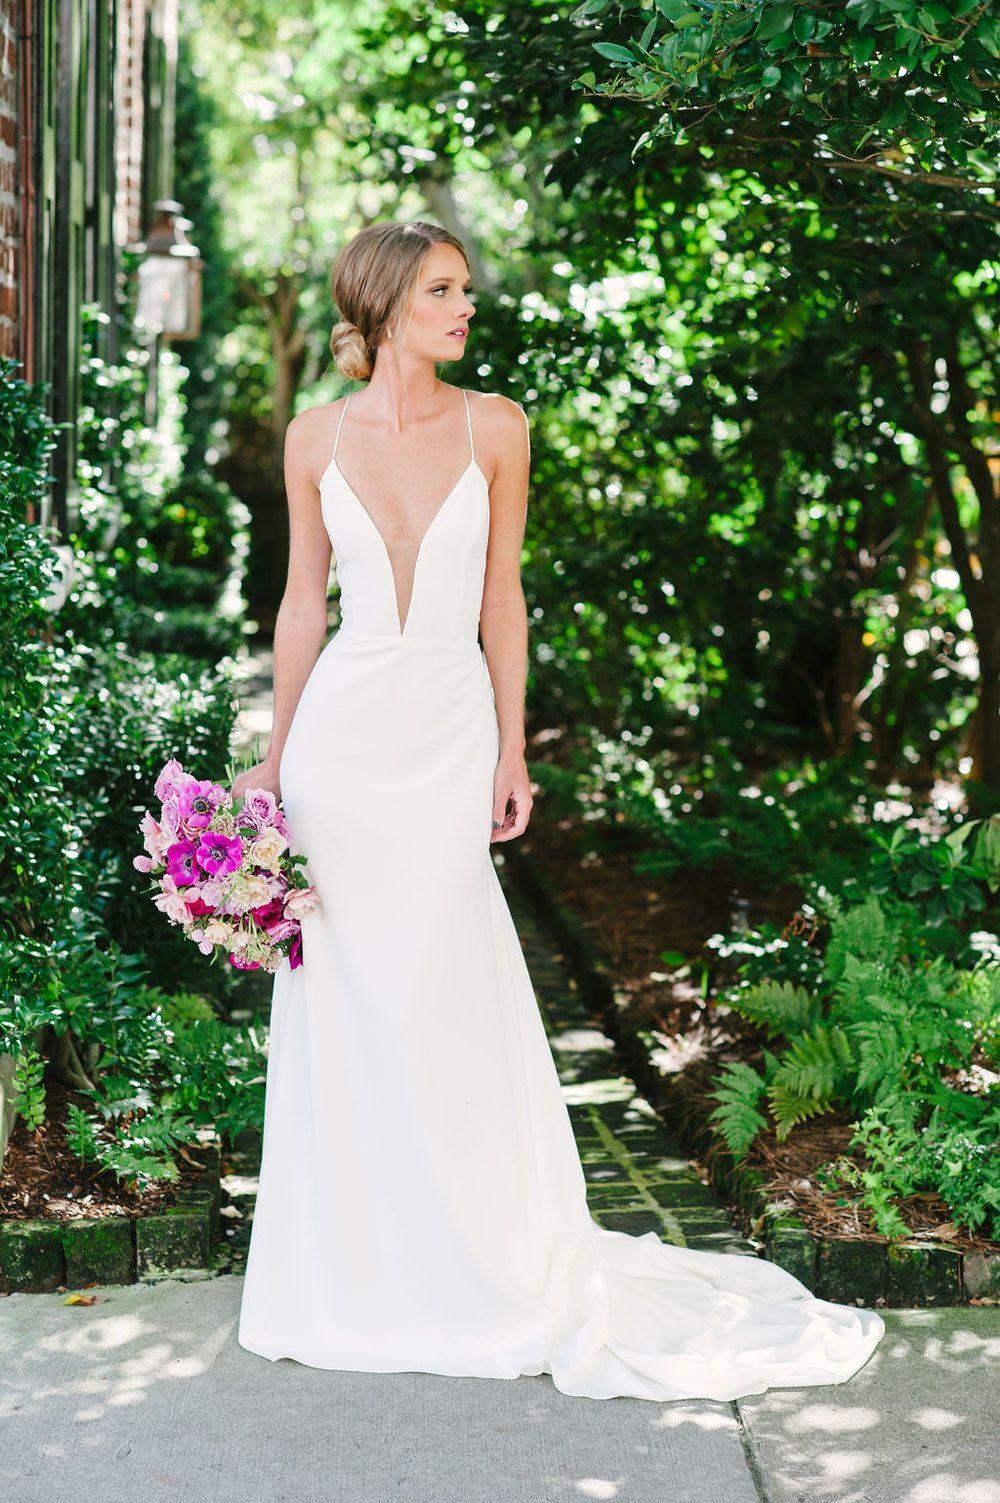 Magnolia Plantation & Gardens Elopement Wedding